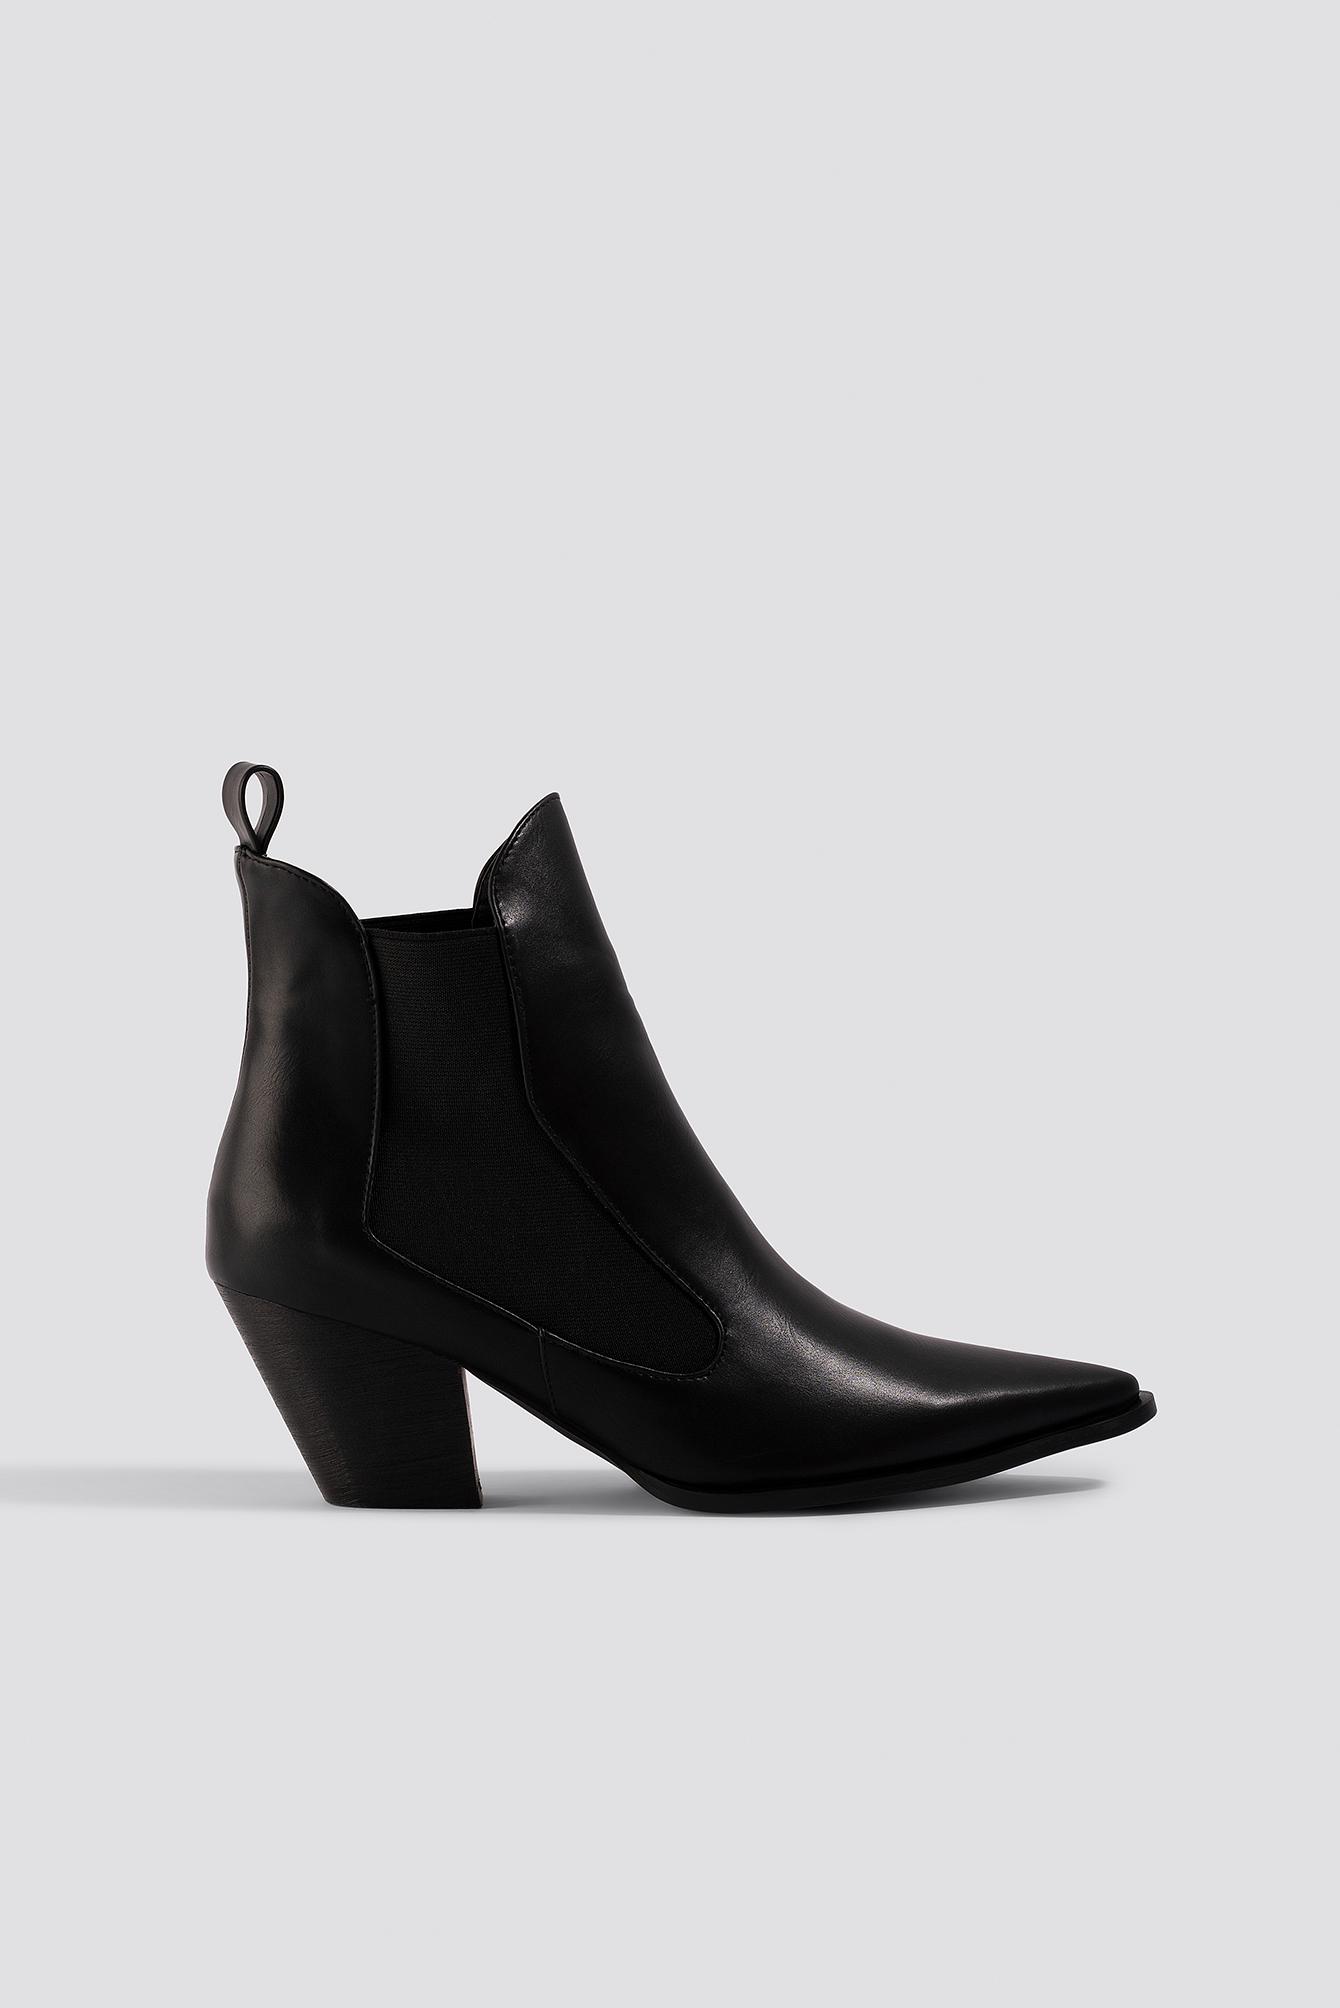 raid -  Flick Ankle Boot - Black